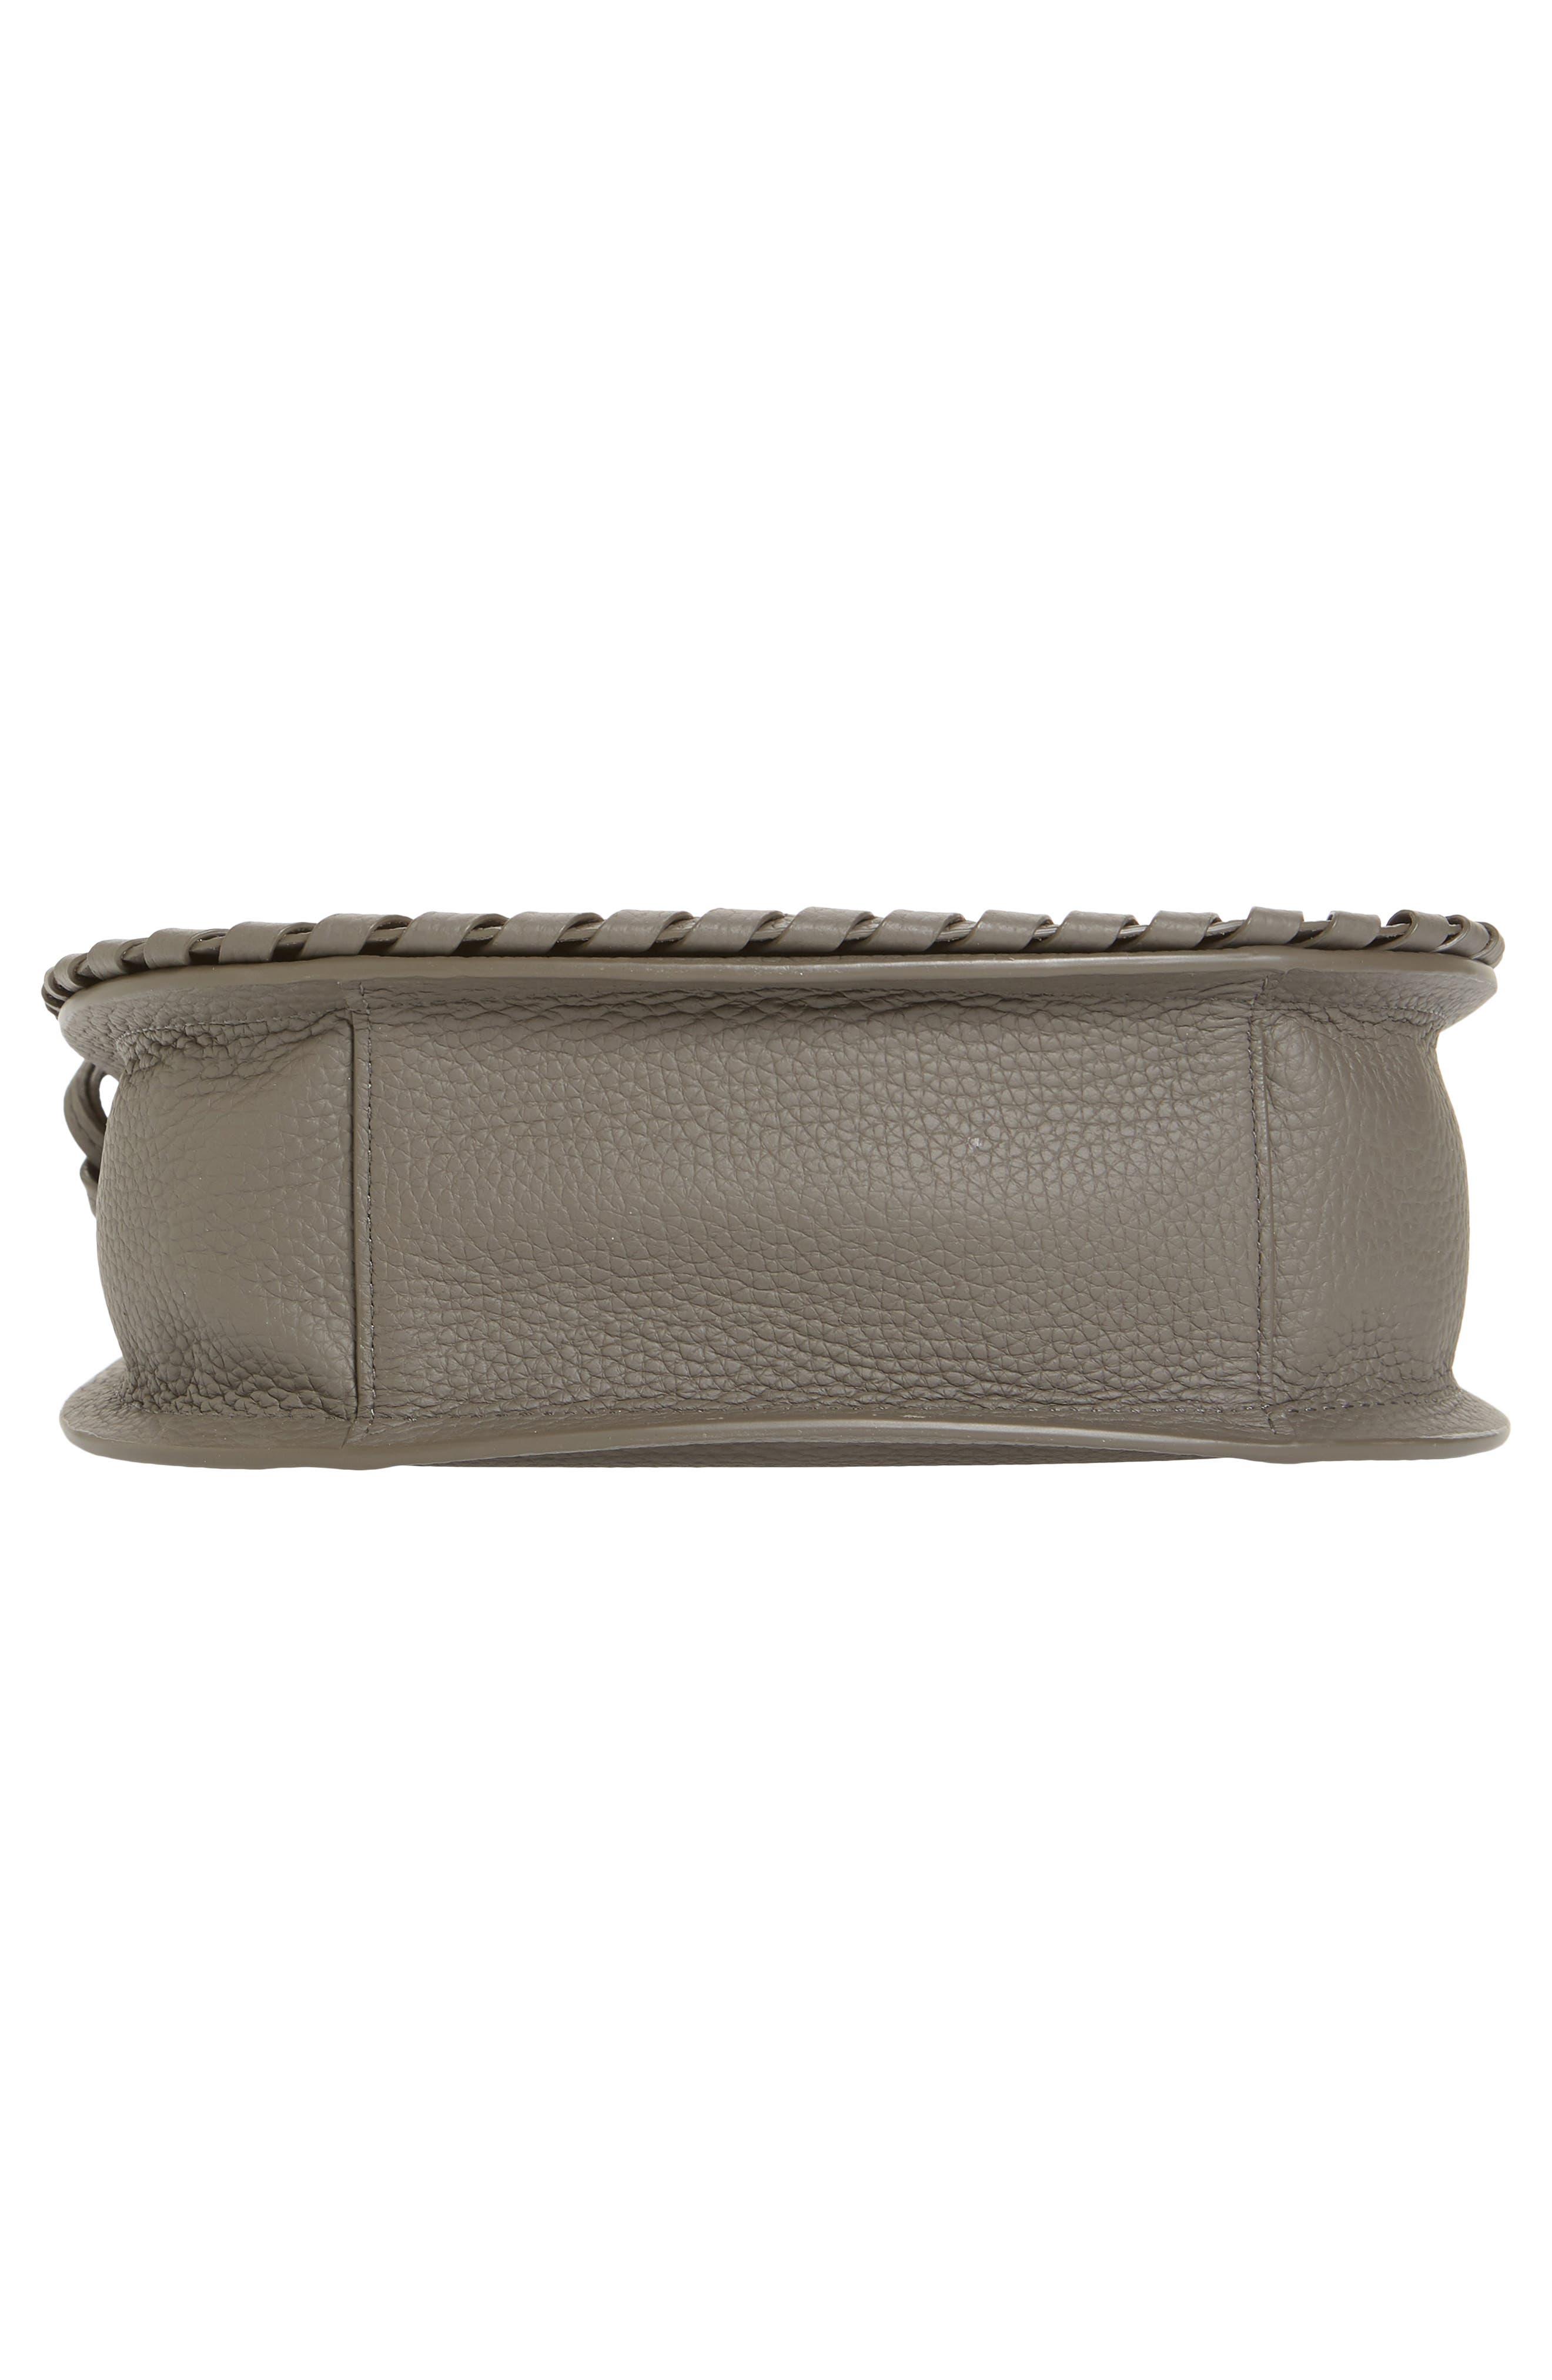 Mori Leather Crossbody Bag,                             Alternate thumbnail 6, color,                             STORM GREY